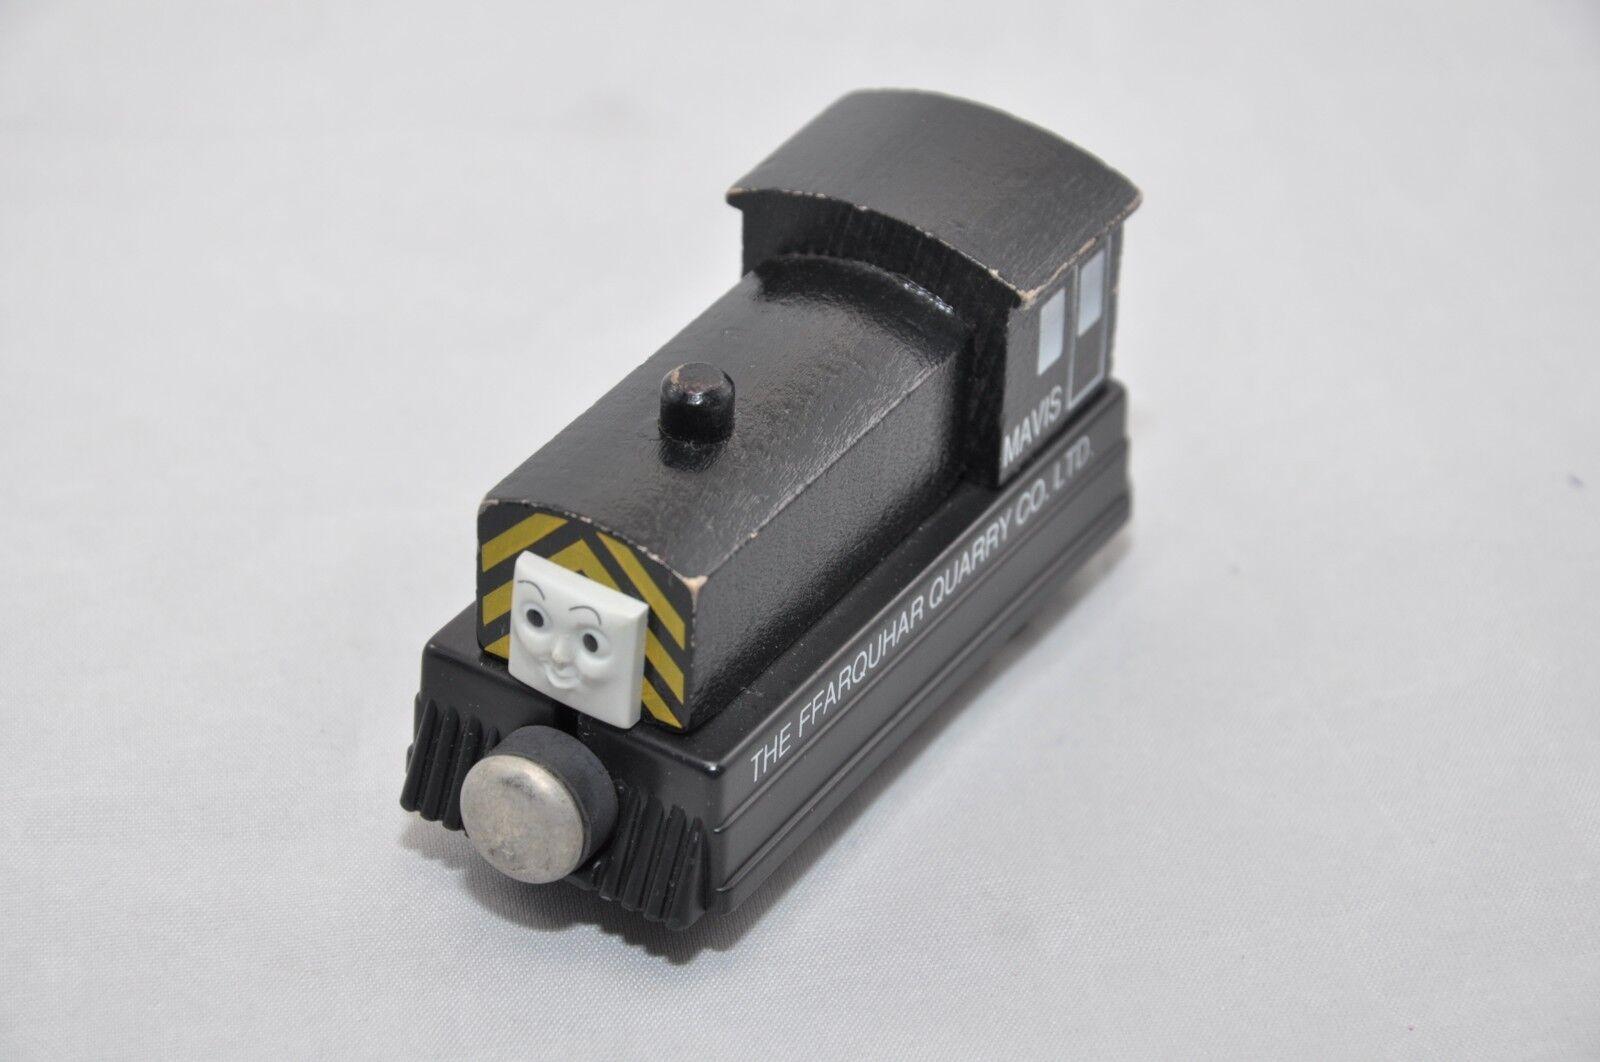 MAVIS   FIRST EDITION EDITION EDITION    Flat magnets & Staples & Undated Wheels   Rare   EUC b389c0